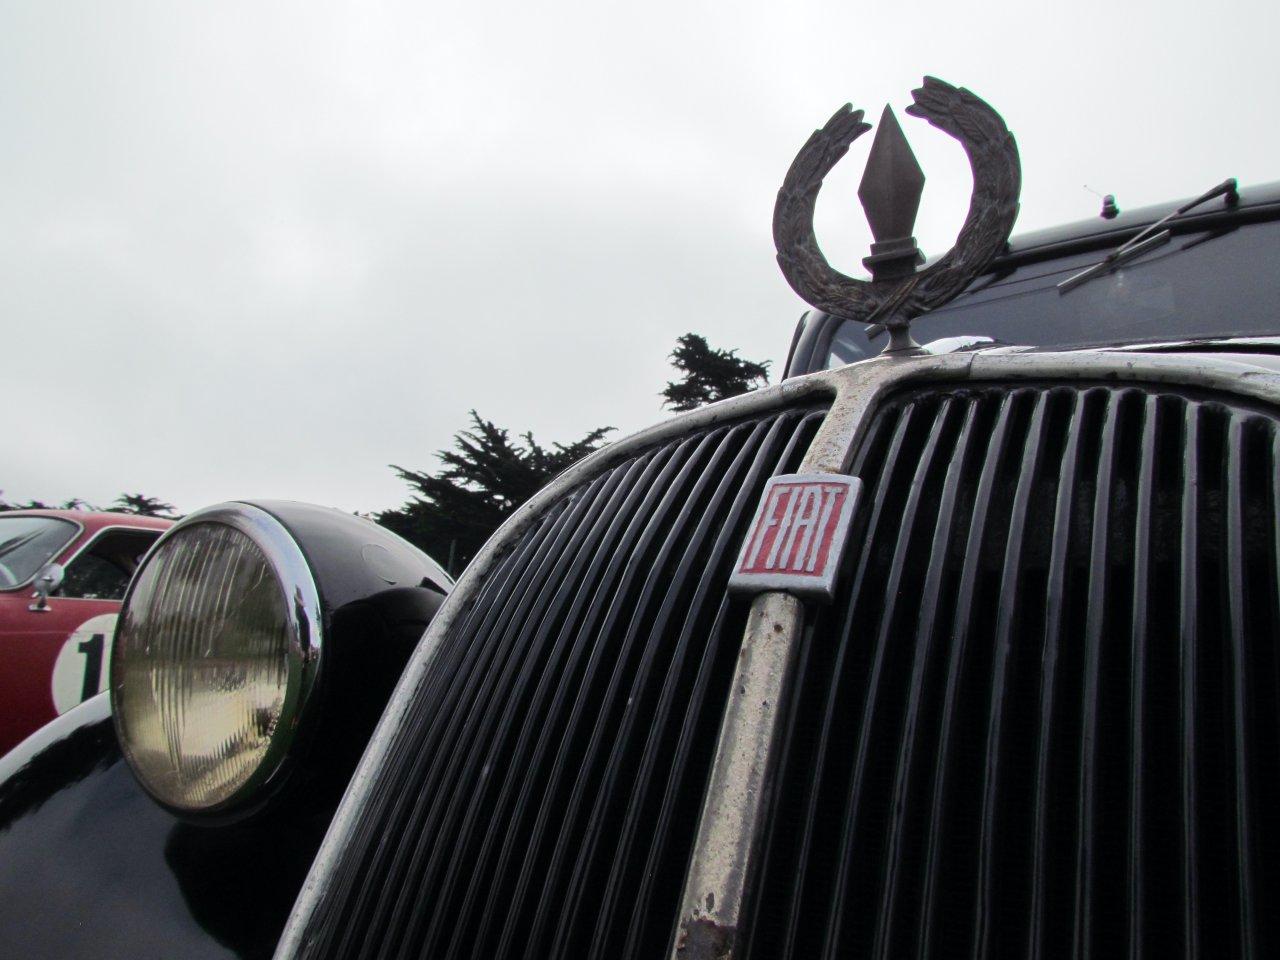 Concorso, Exotic no hyperbole in describing this 1927 Lancia, ClassicCars.com Journal